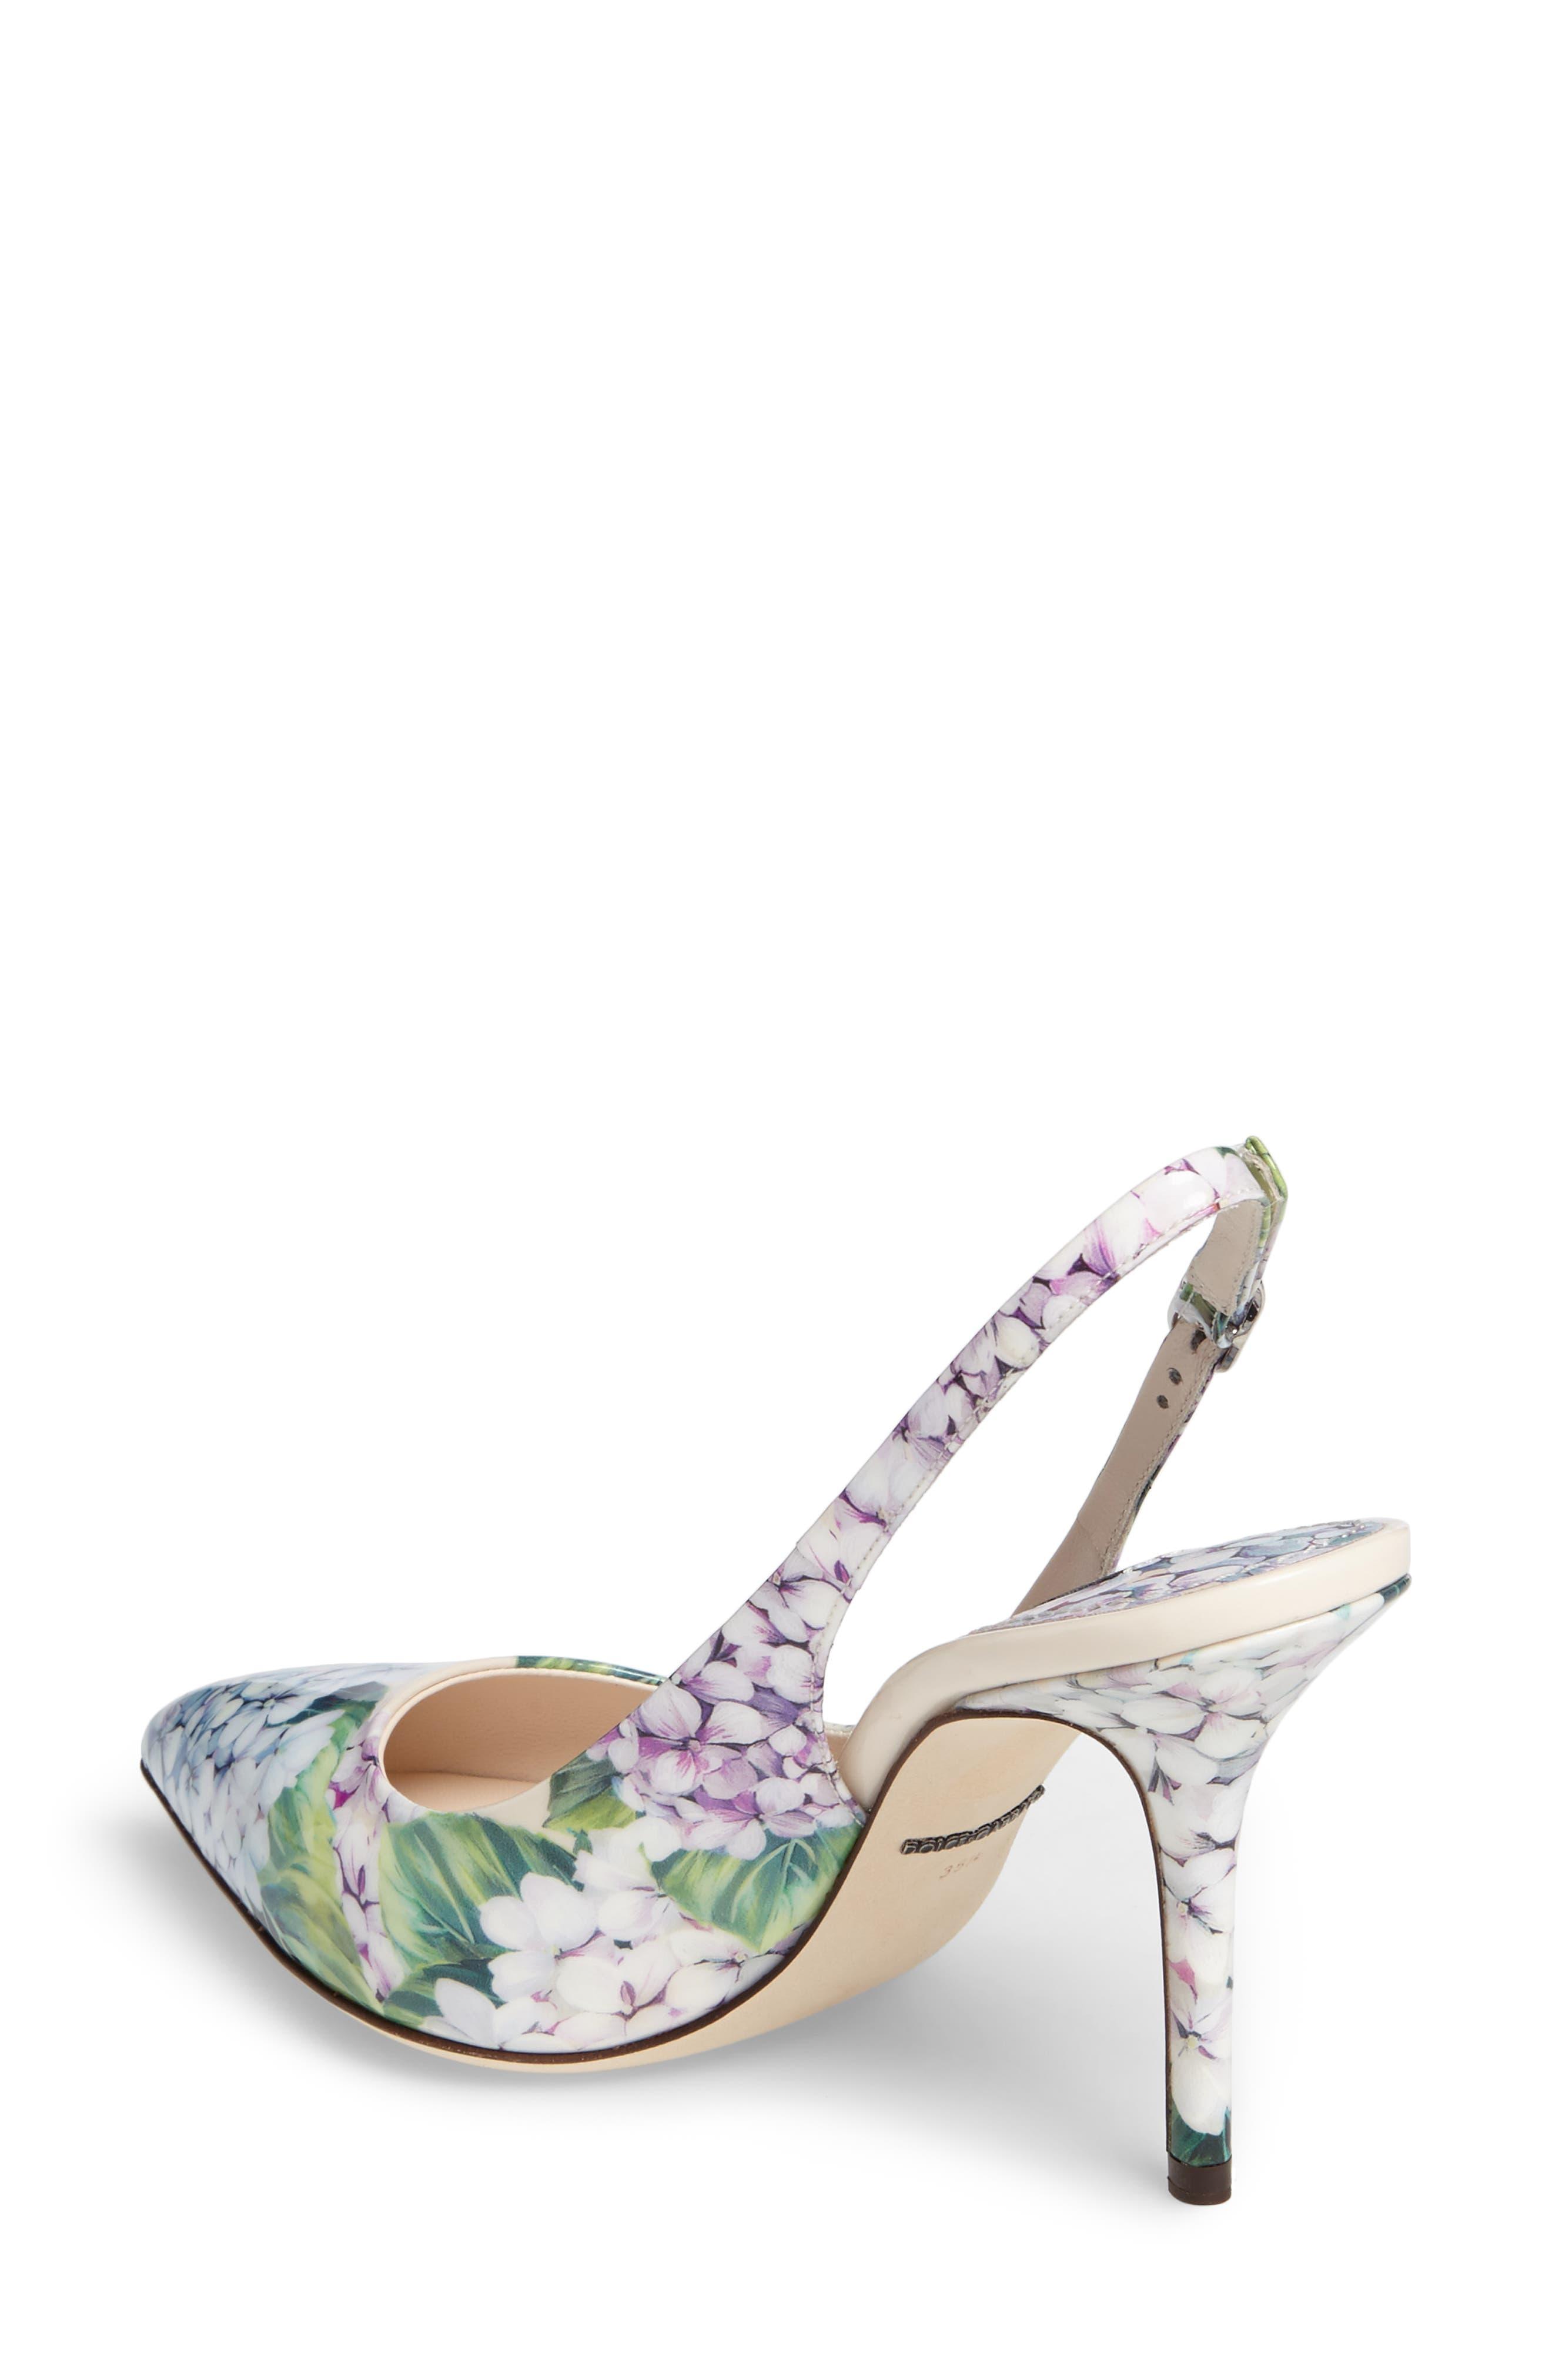 Hydrangea Slingback Sandal,                             Alternate thumbnail 2, color,                             White Floral